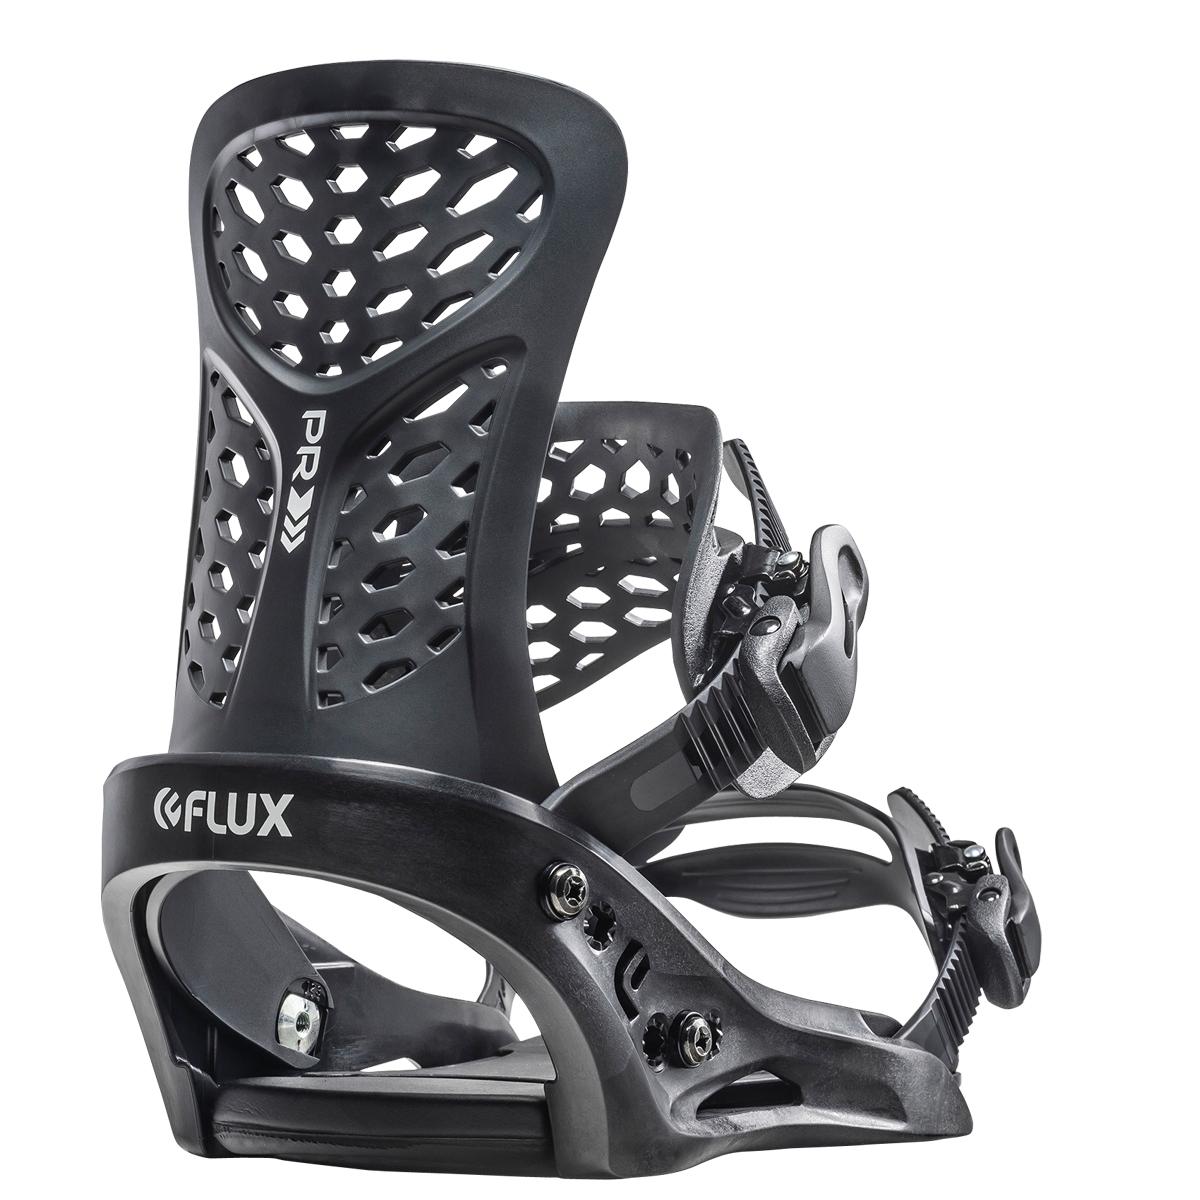 【19-20】FLUX PR BLACK フラックス ビンディング メンズ